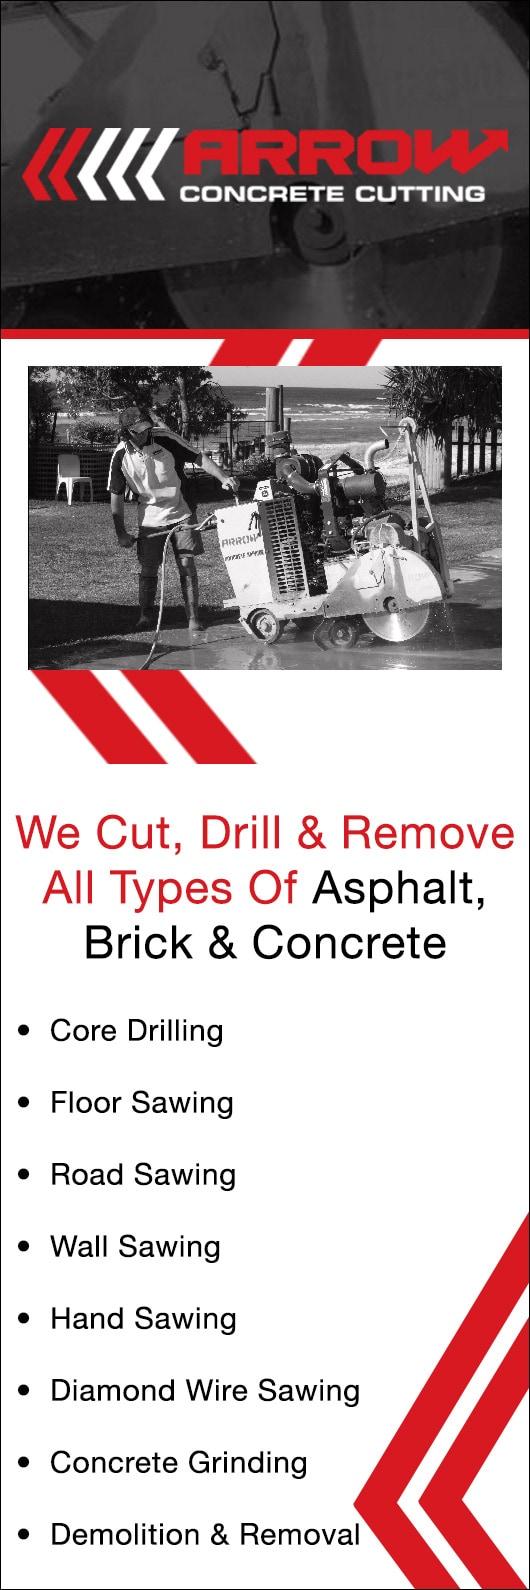 Arrow Concrete Cutting - Concrete Cutting, Grinding & Drilling - BALLINA